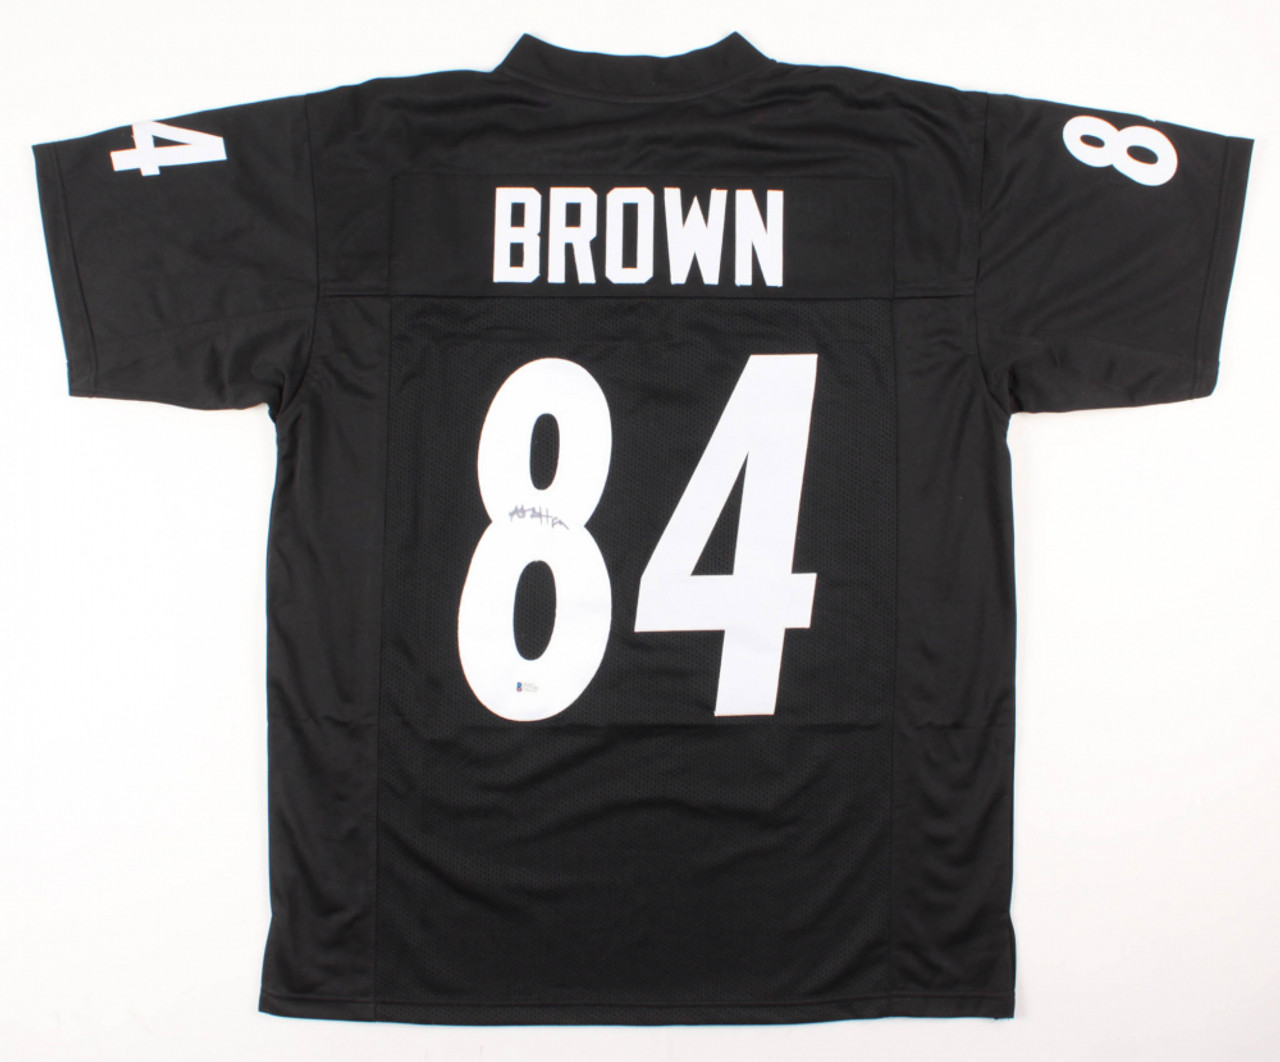 sale retailer 860f2 e48d4 Antonio Brown Oakland Raiders Autographed Custom Football Jersey